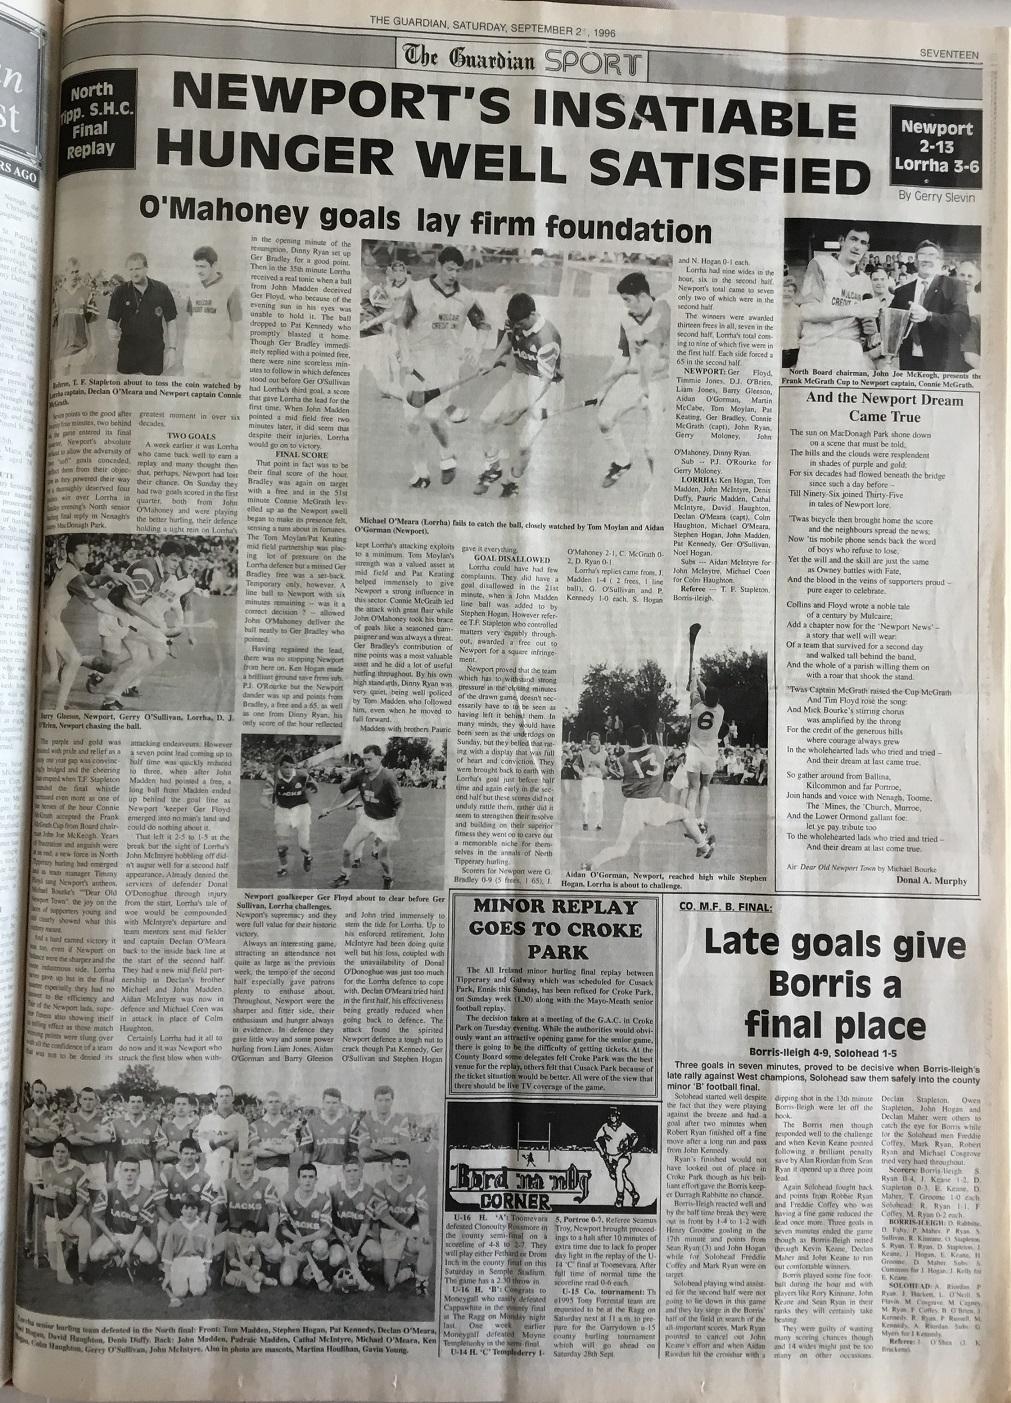 1996 North hurling final replay